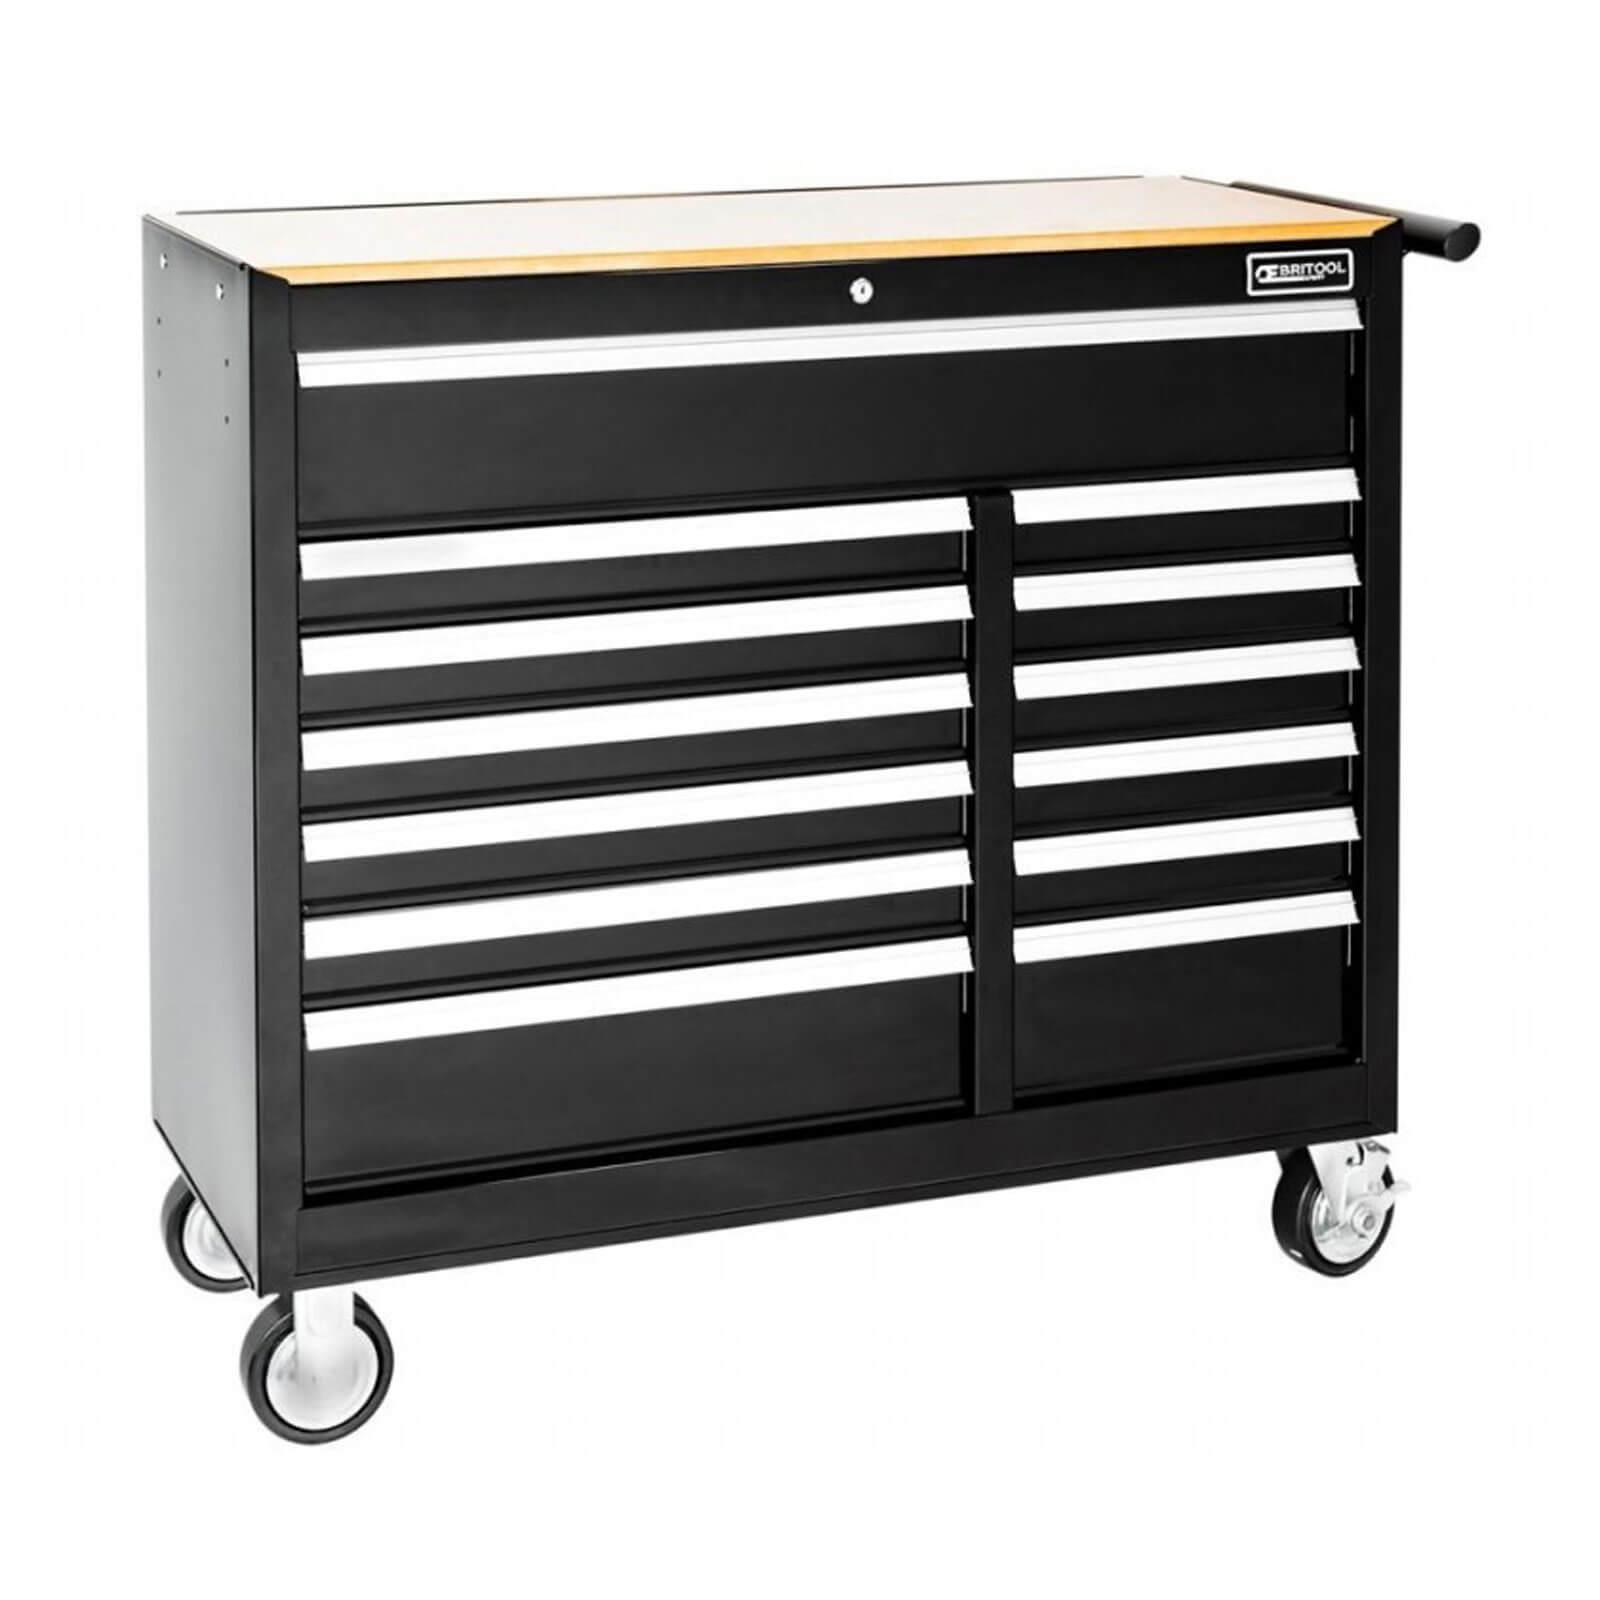 Image of Britool 13 Drawer Roller Cabinet Black